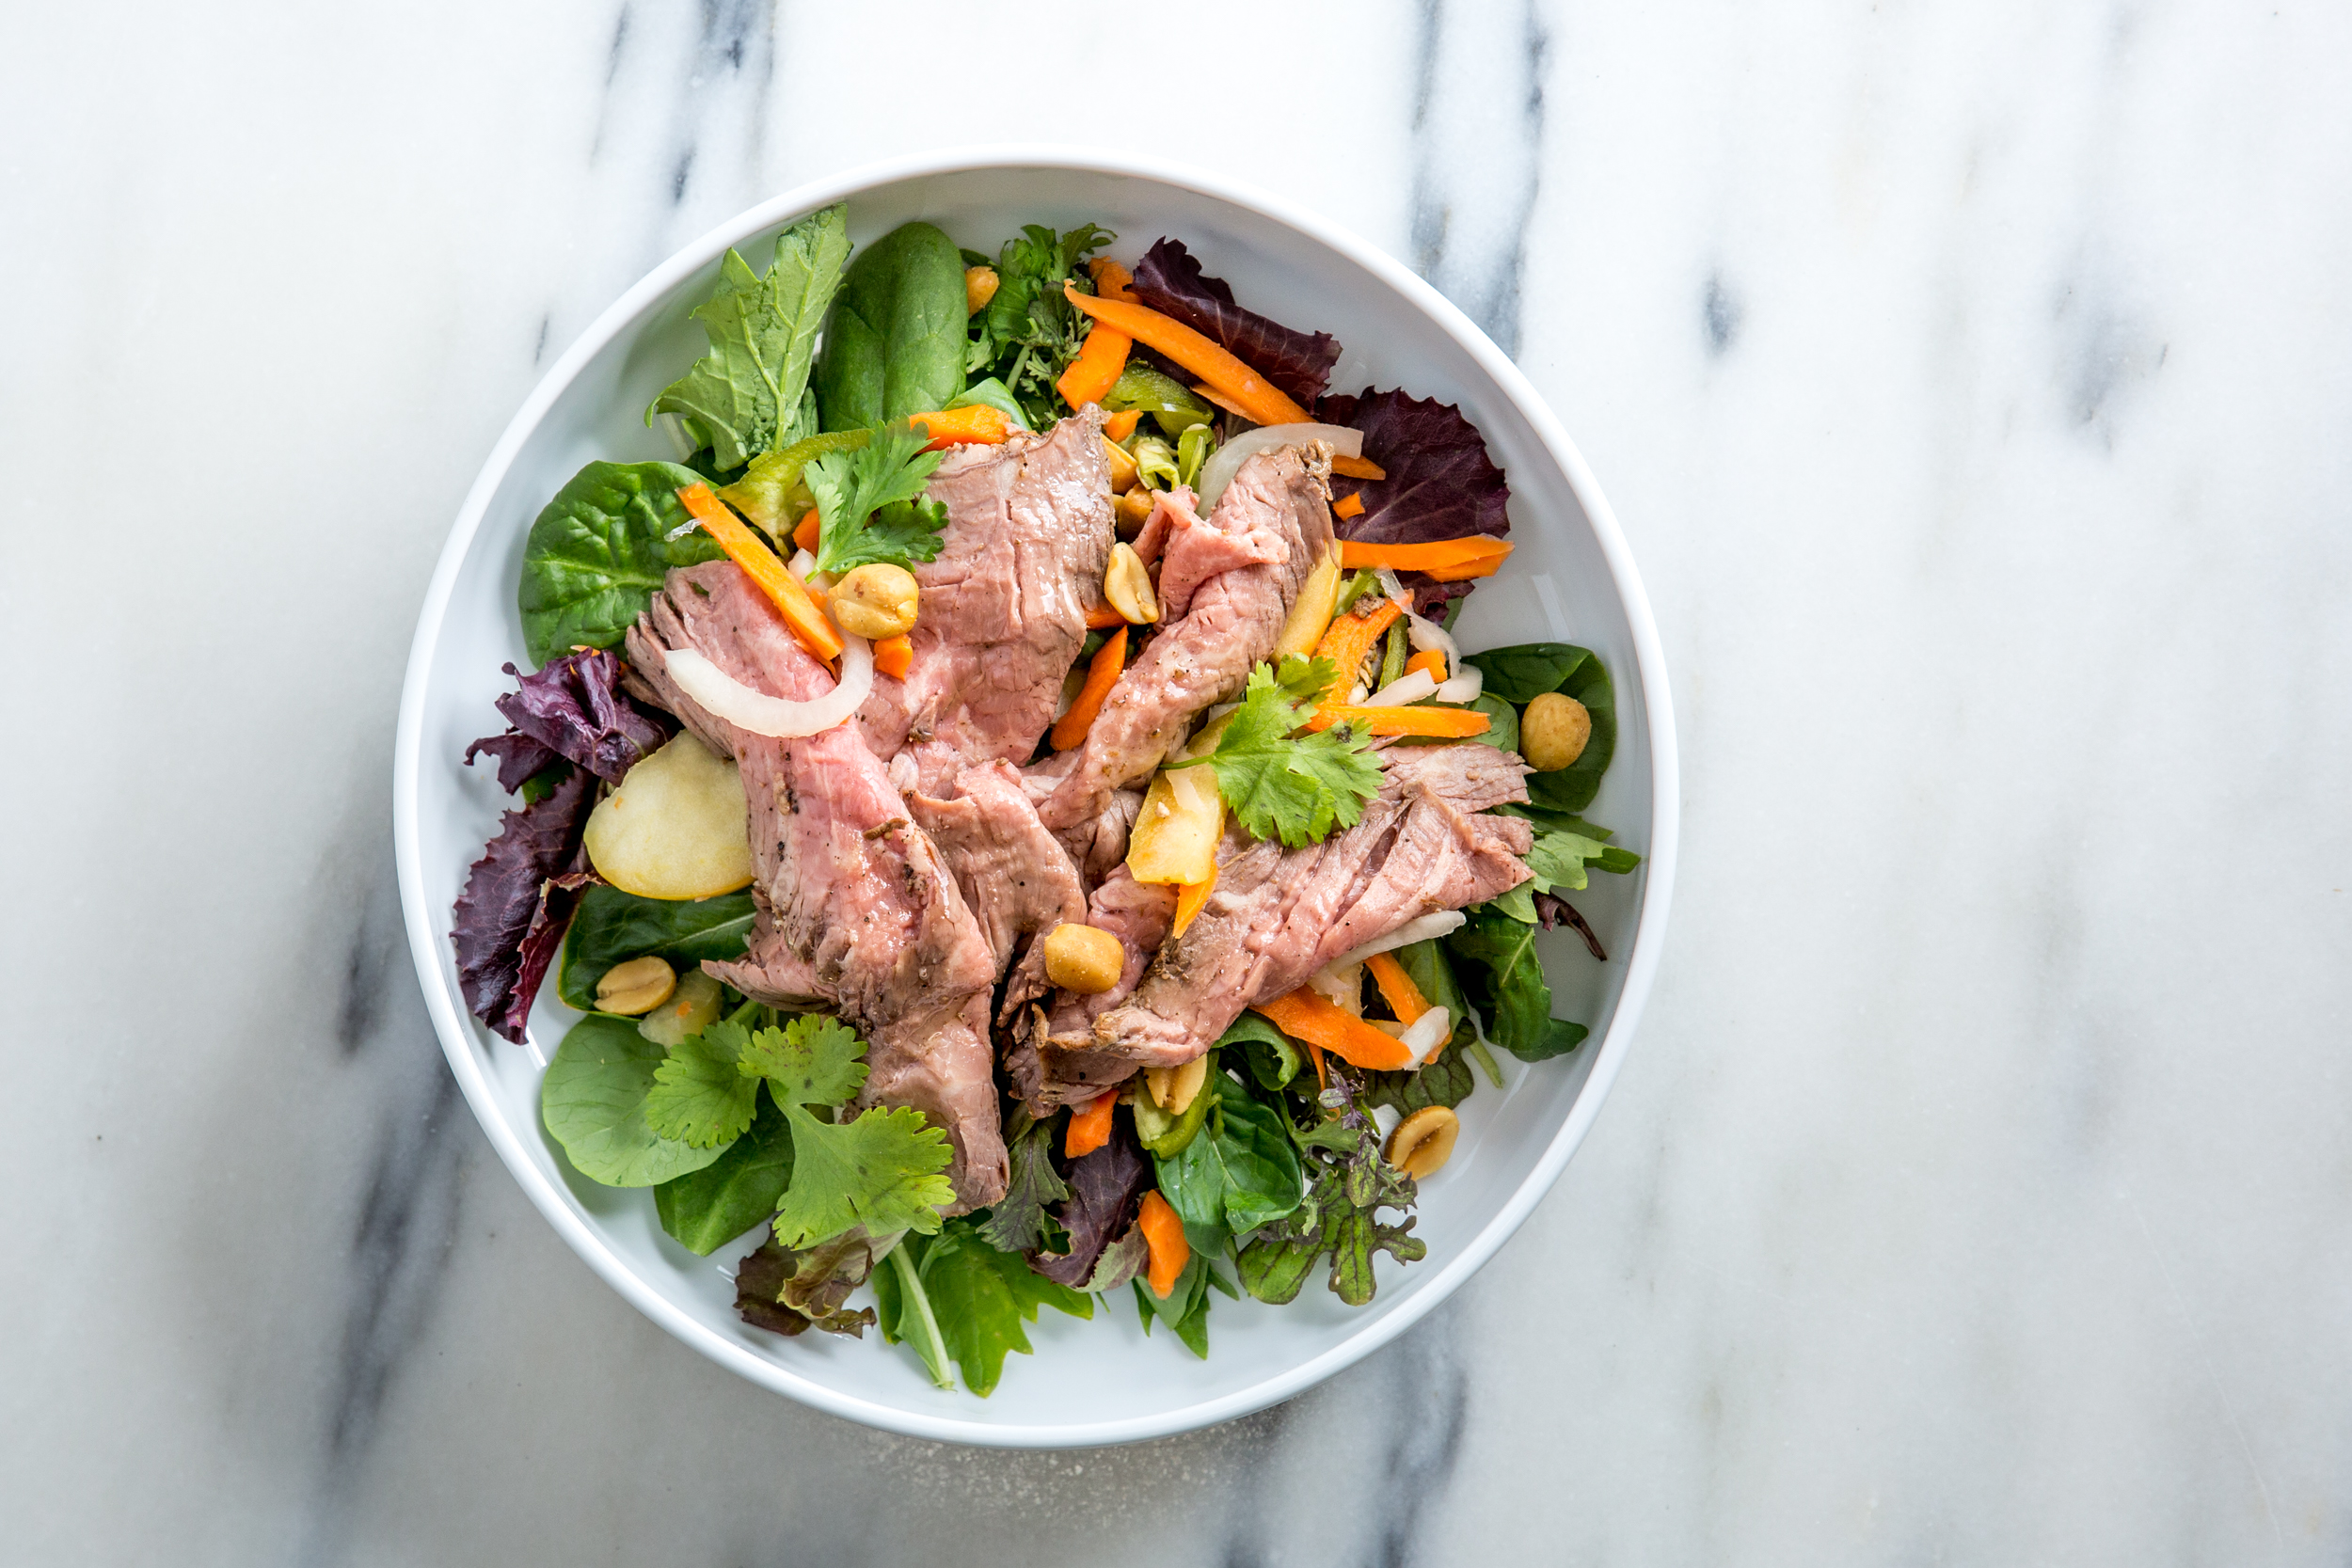 Hanoi Steak Salad - Roasted Tri-Tip + Asian pickles + cilantro + peanuts + Viet Vinaigrette + Greens - $11.95